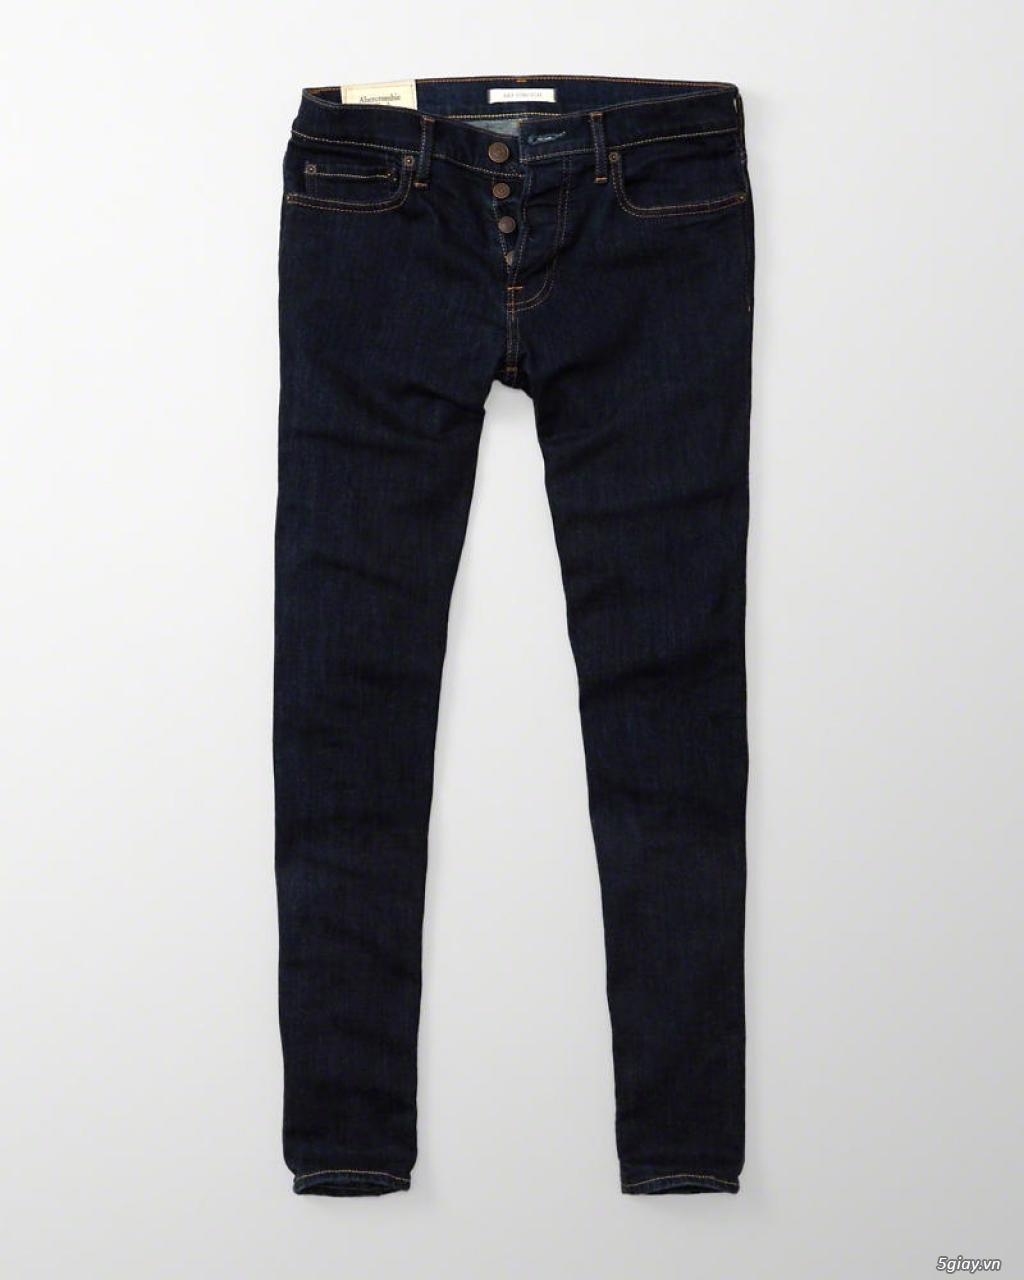 [ Lamanshop.com ]- Quần áo HOLLISTER - ABERCROMBIE & FITCH - Chính hãng USA 100% - 6